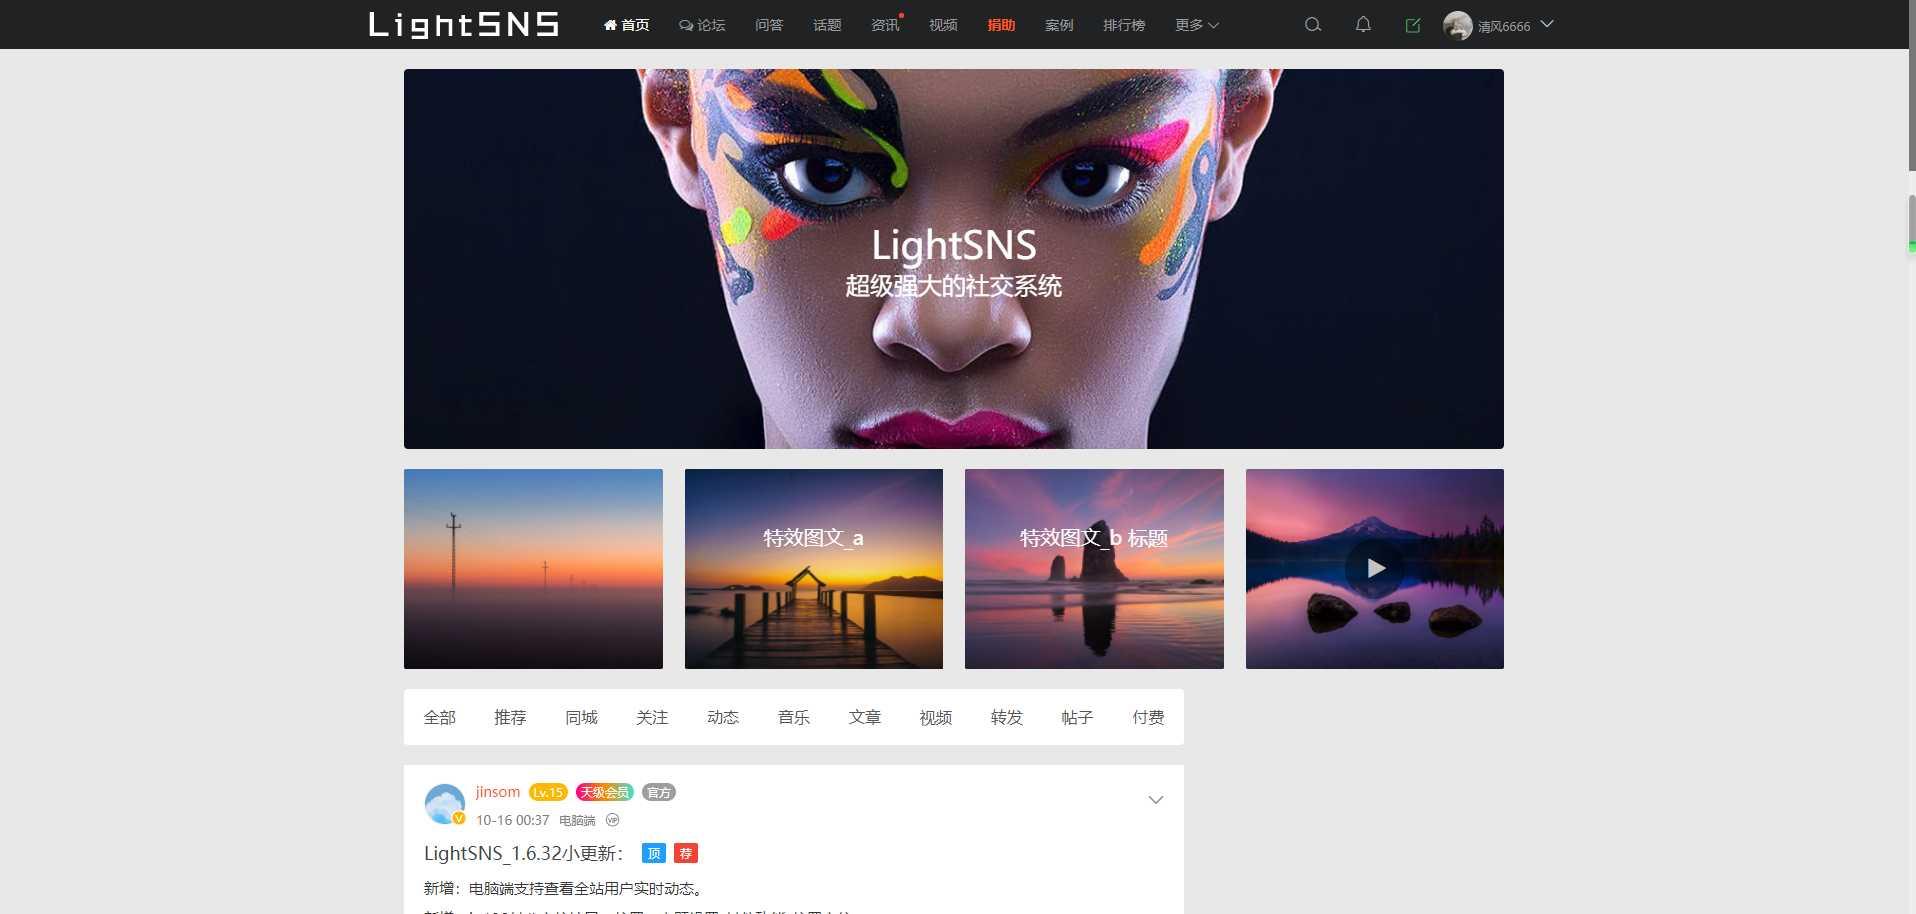 WordPress主题LightSNS轻社区破解版源码 LightSNS 1.6.29版